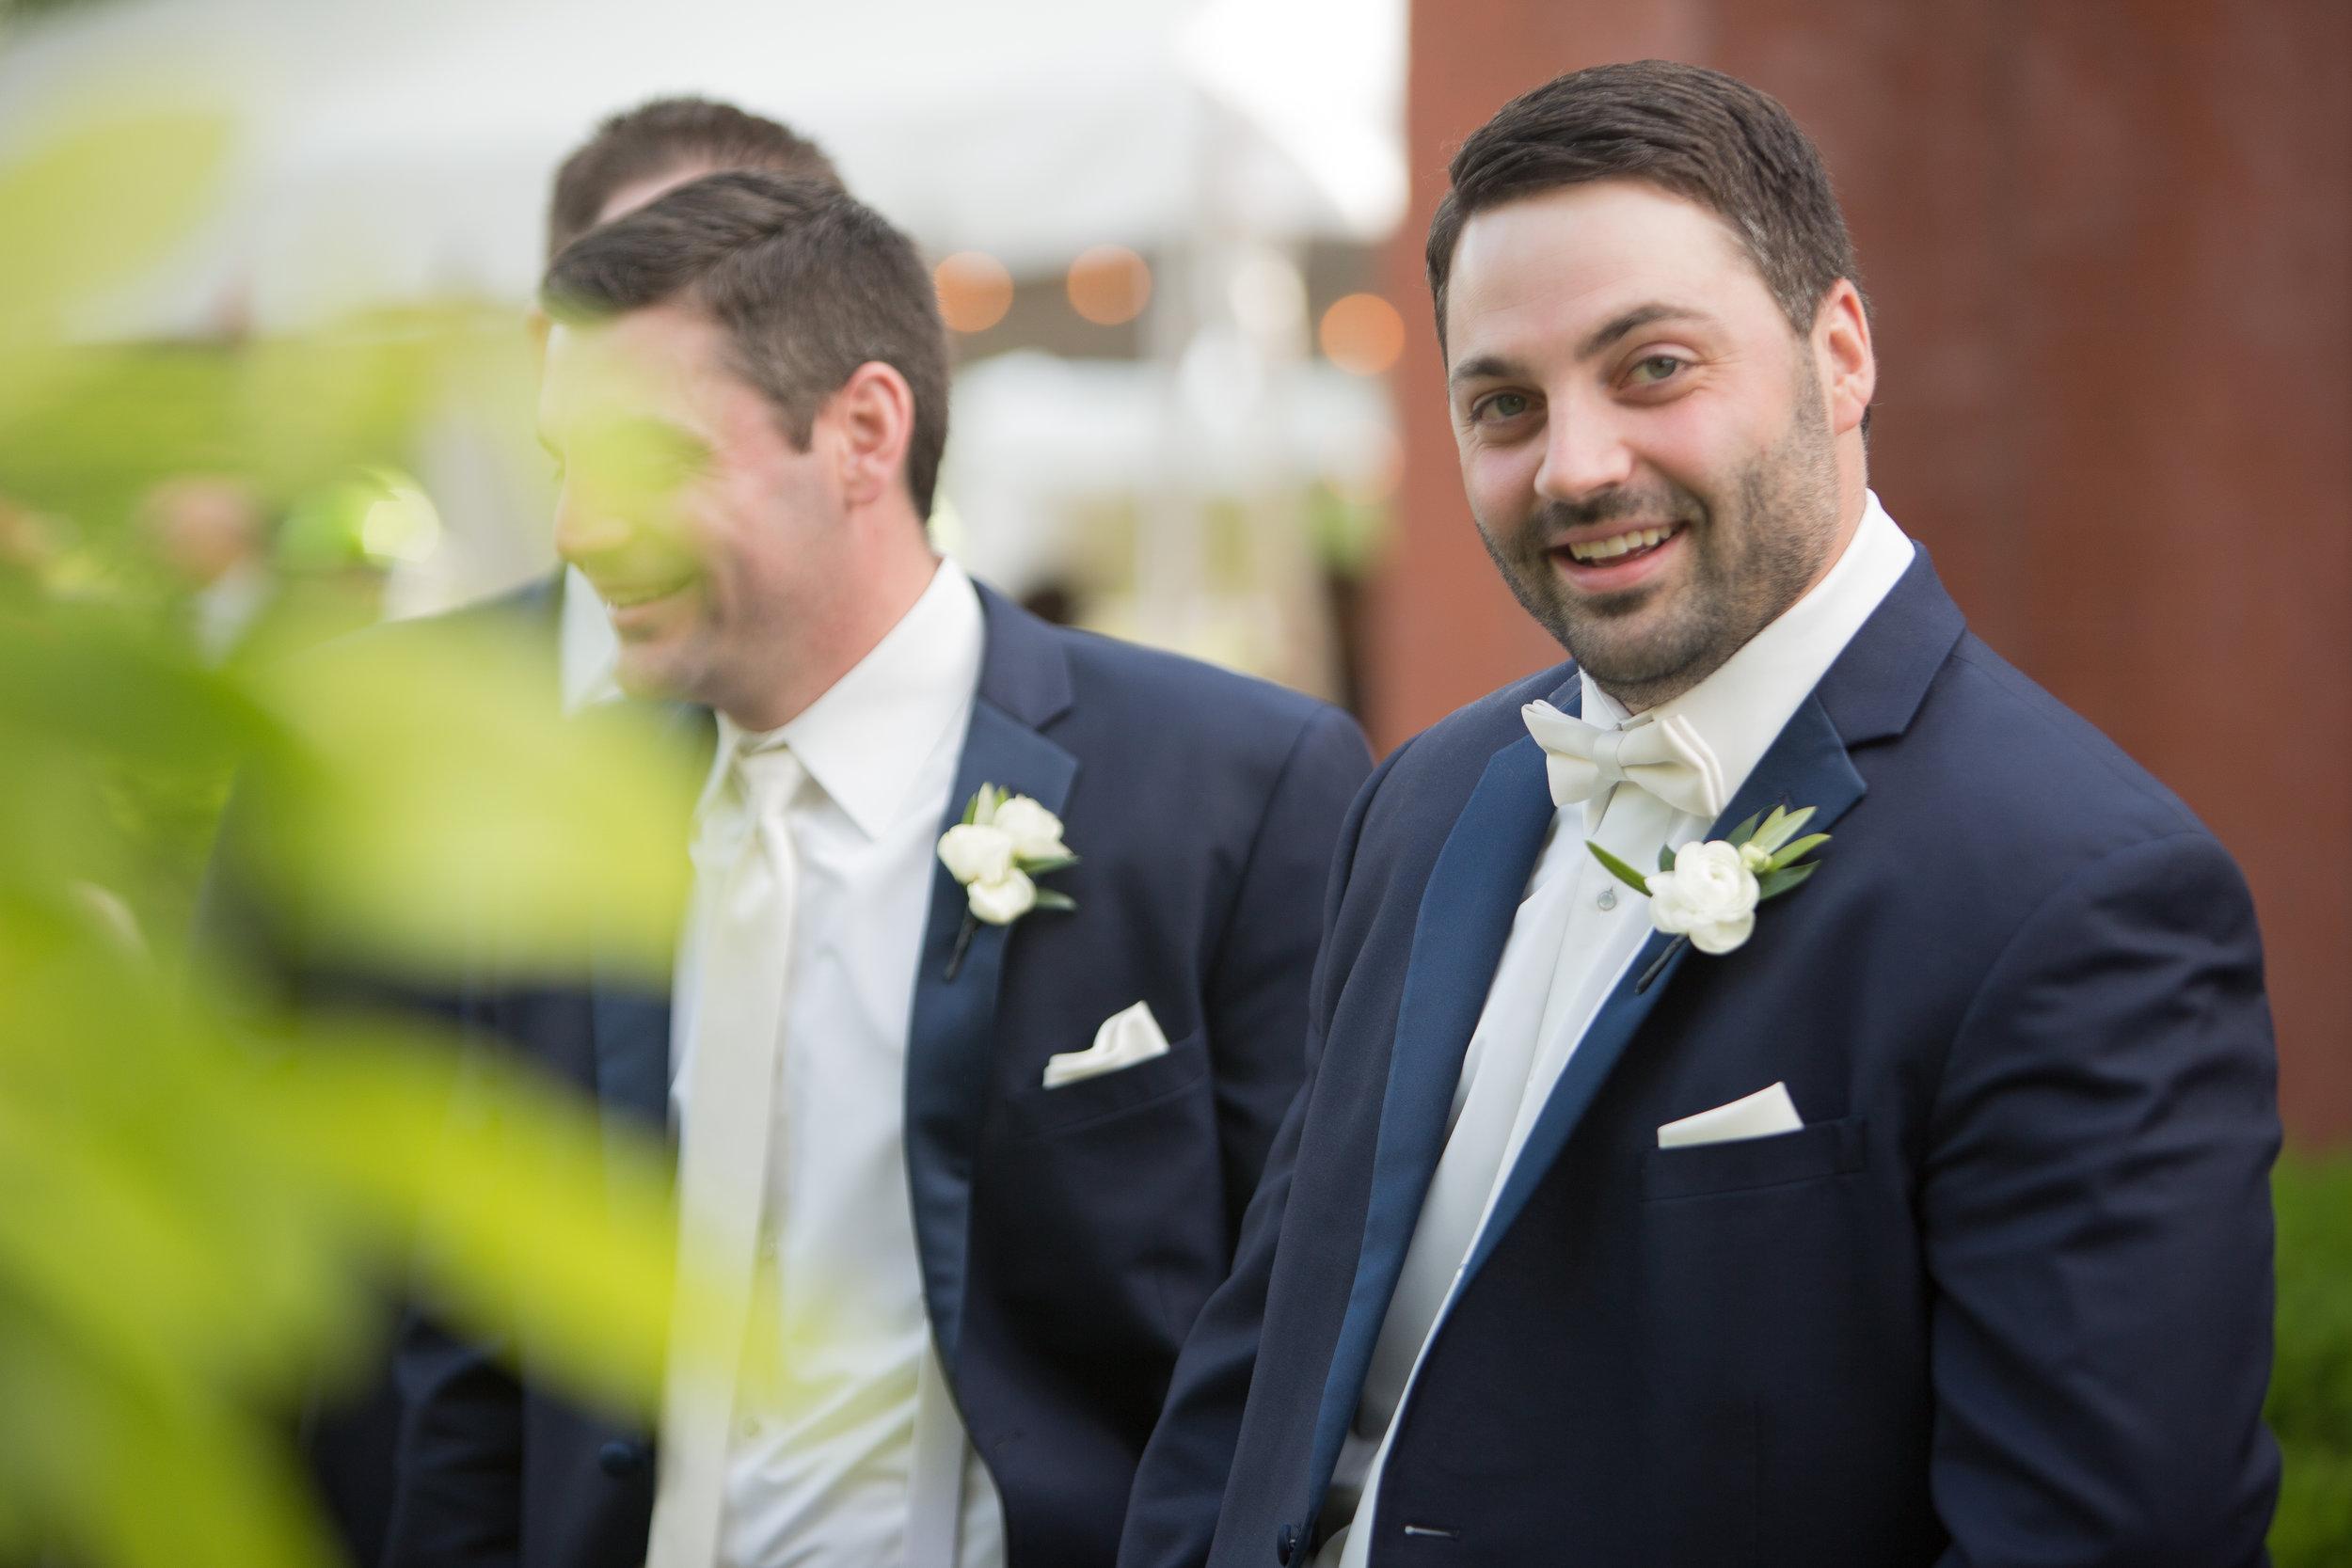 St. Louis Photographer St. Charles Photographer Engagement Wedding Photographer (60).jpg